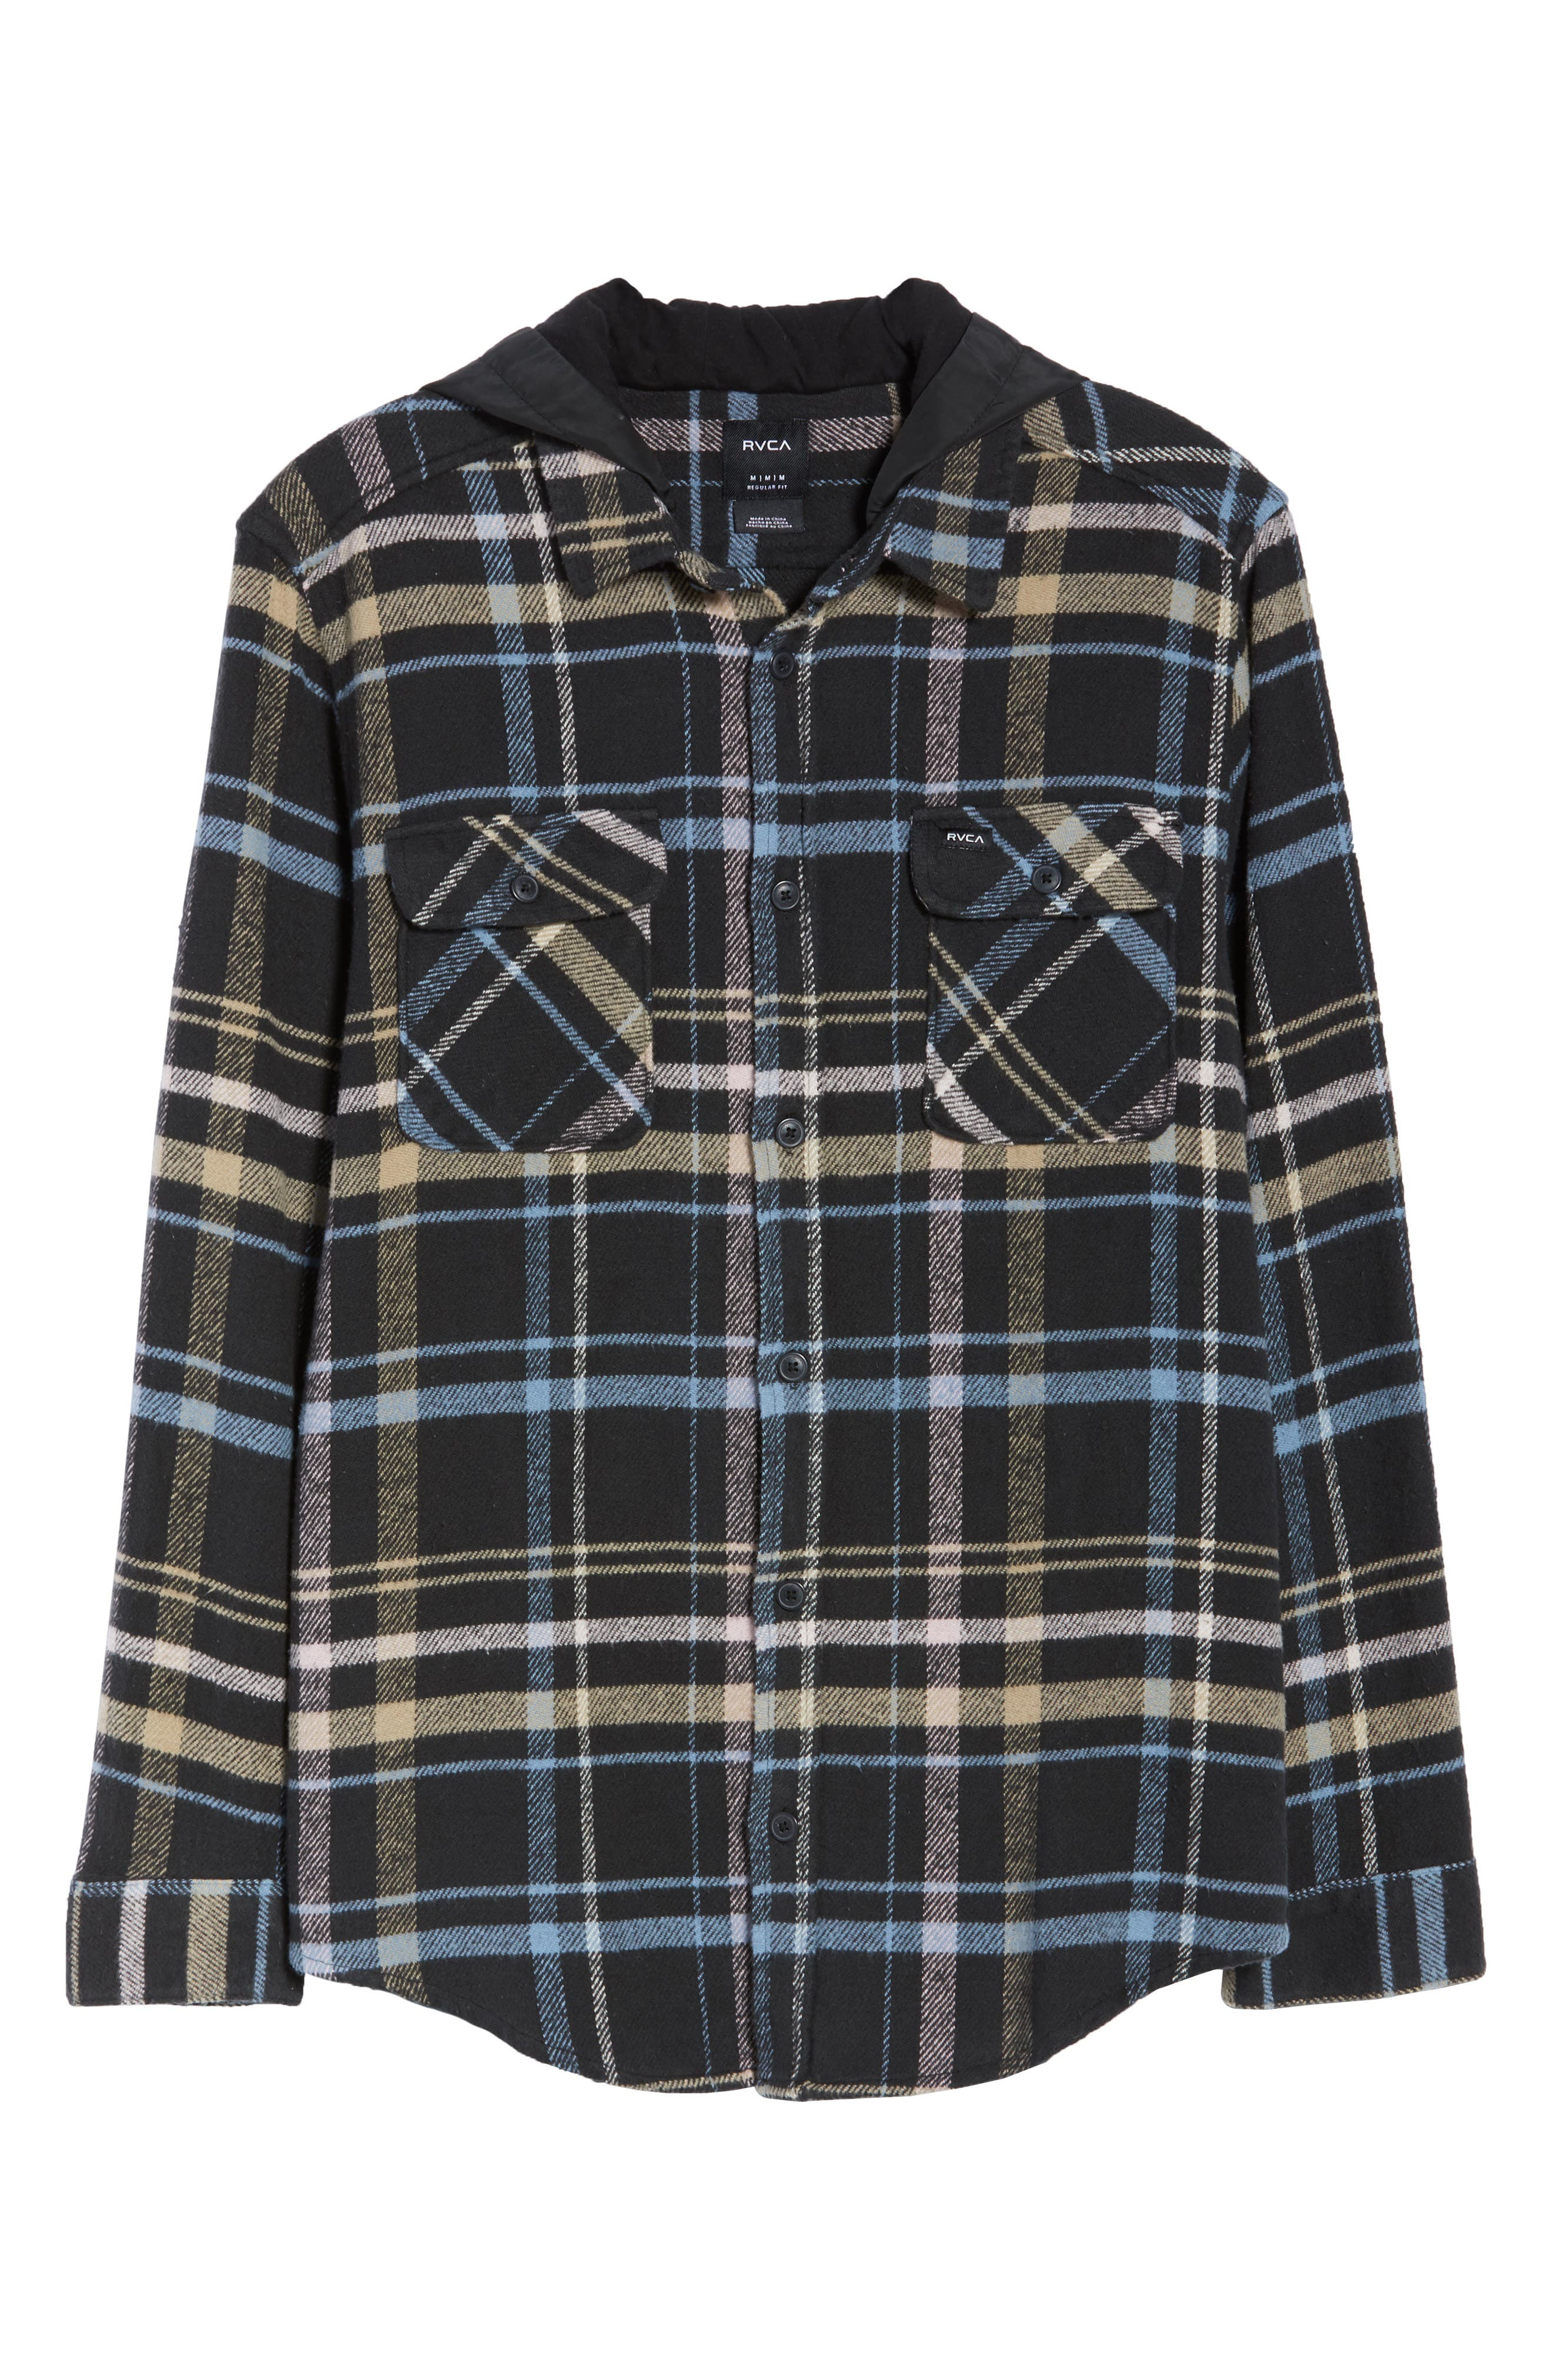 RVCA, Essex Hooded Flannel Shirt, Alternate thumbnail 5, color, RVCA BLACK